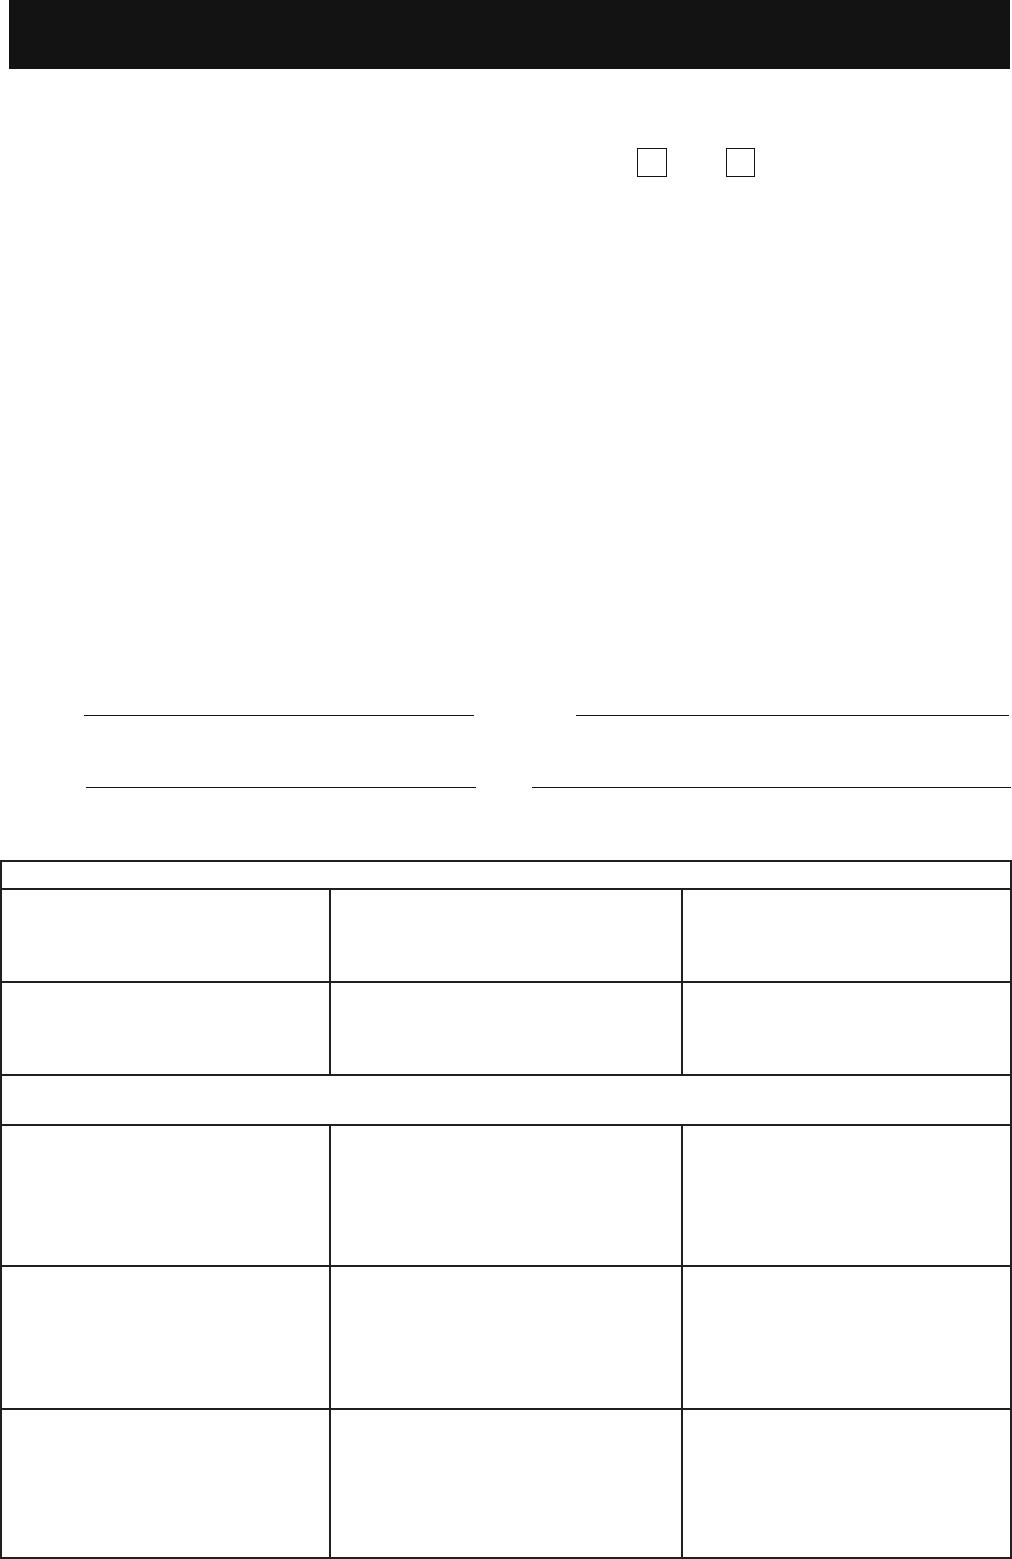 Free Printable Woolworths Job Application Form Page 5